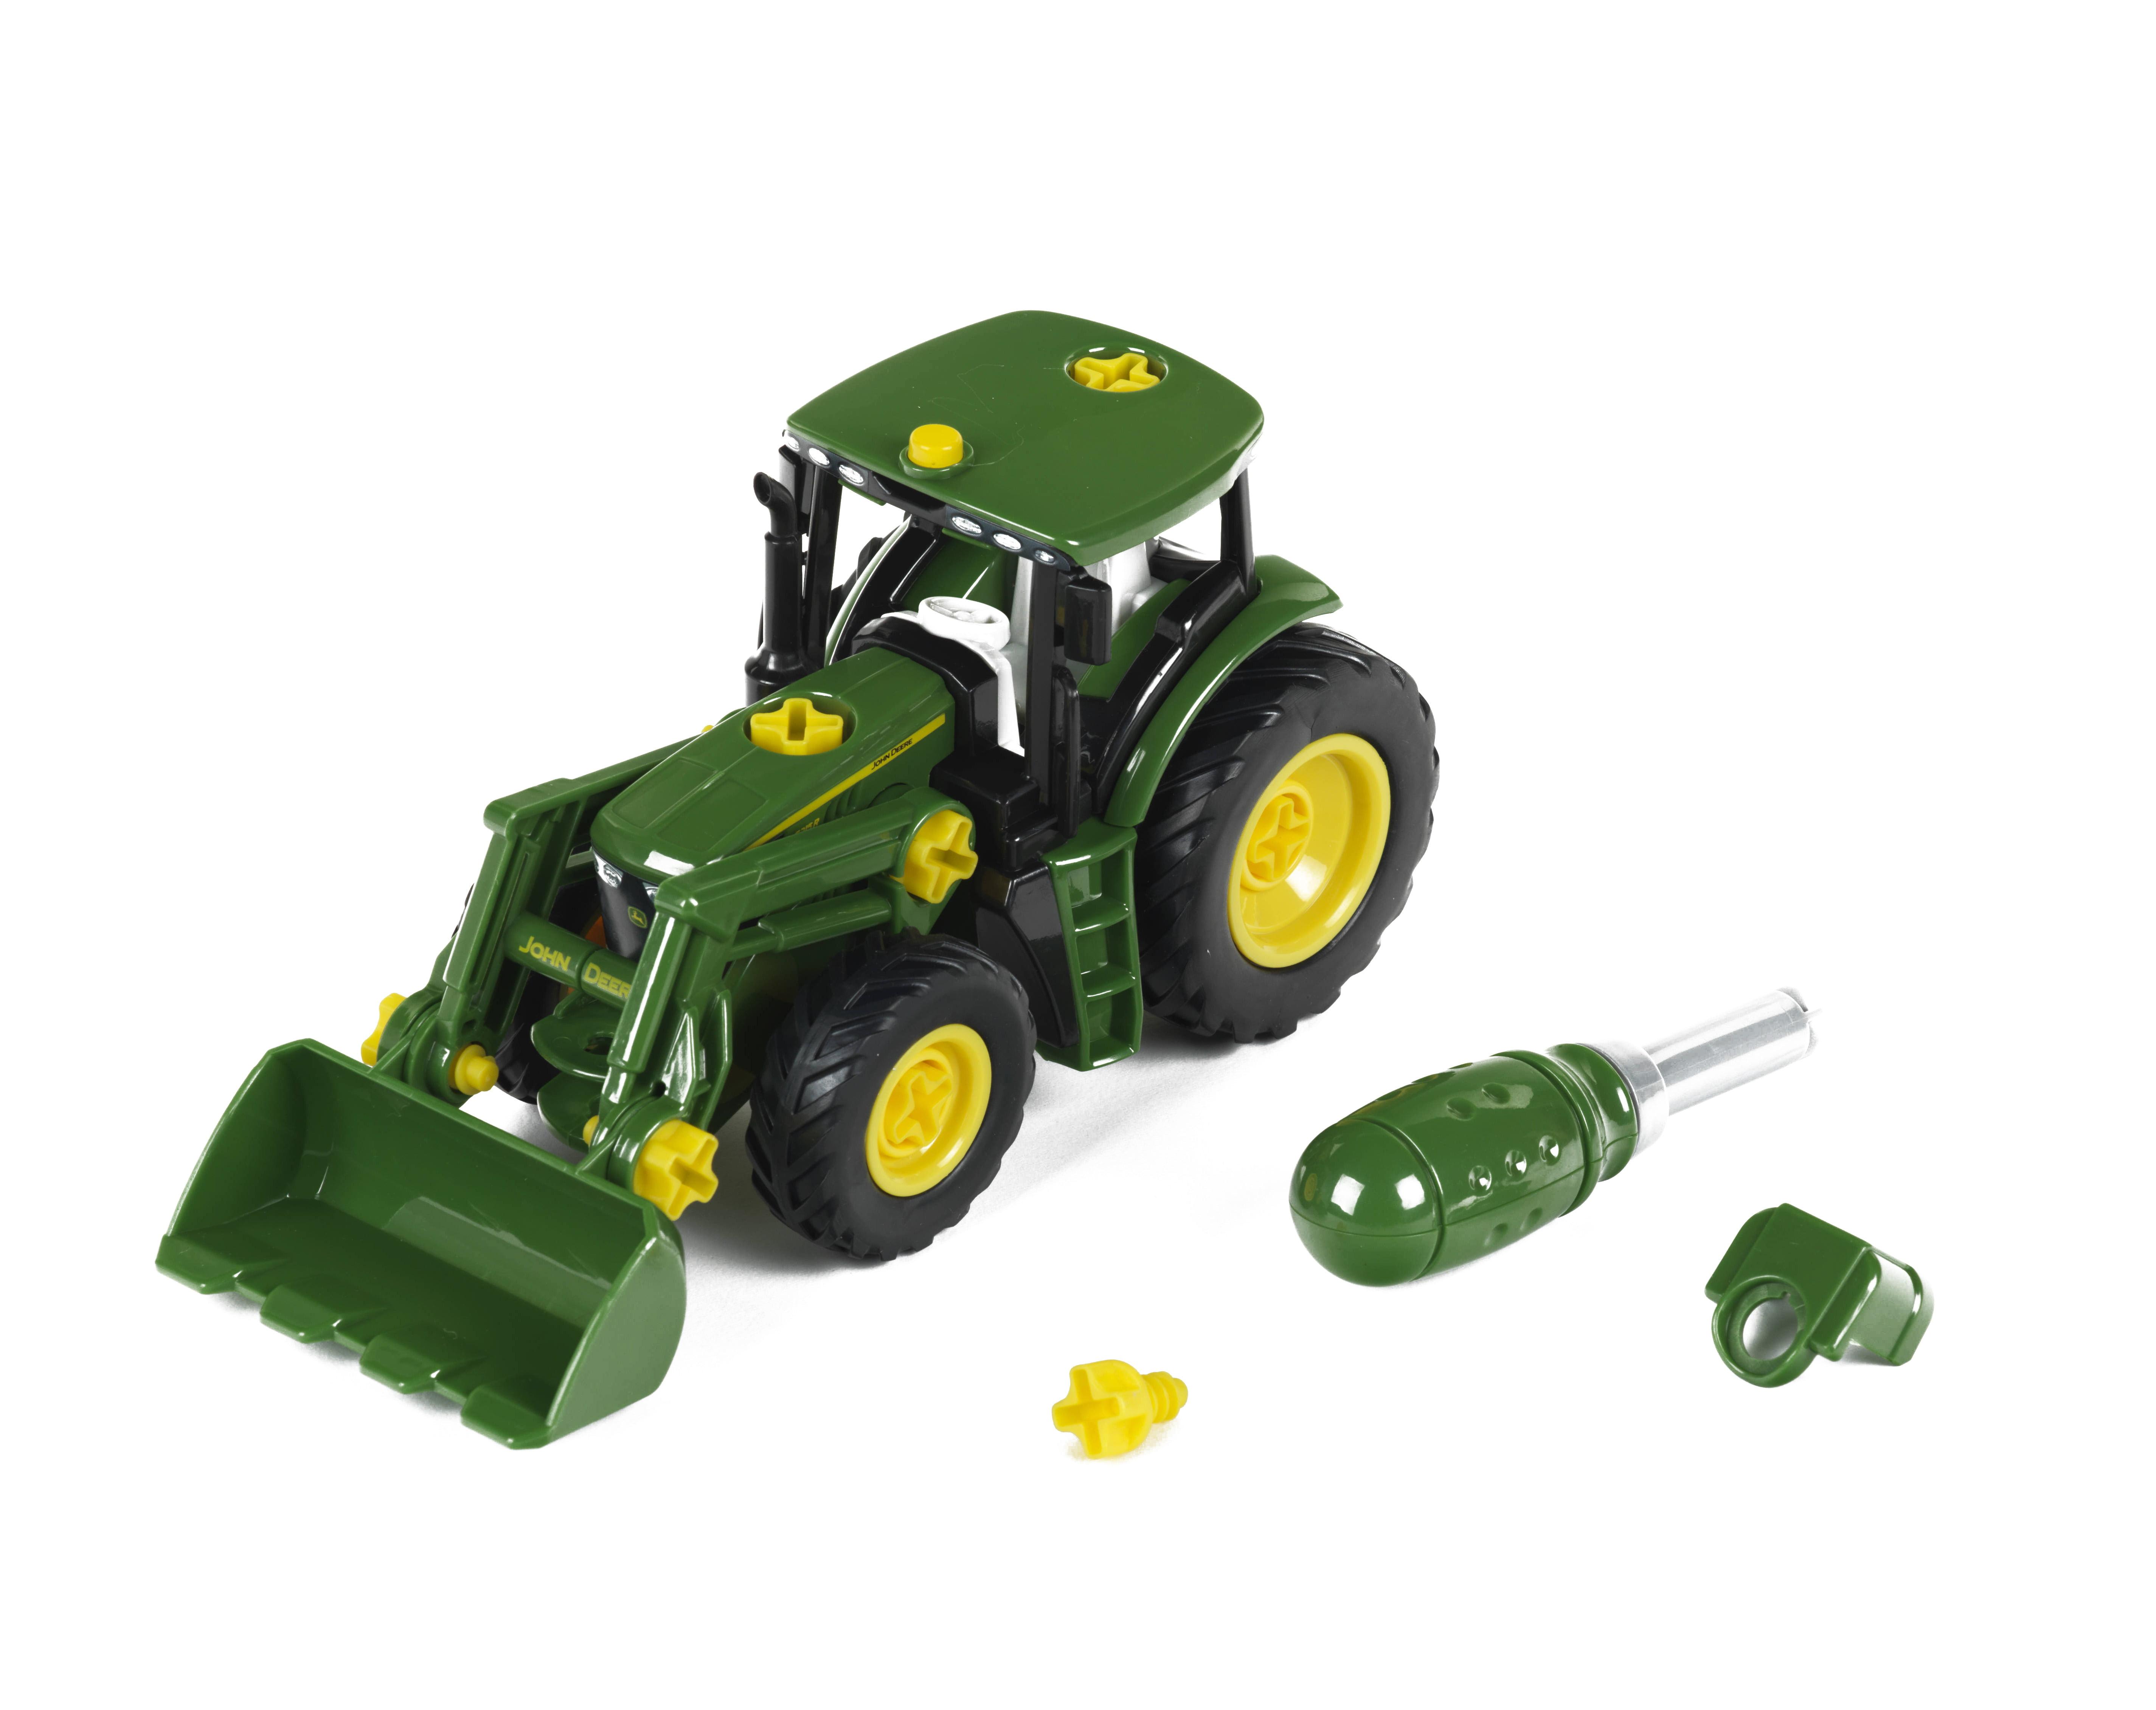 John Deere Tractor by Theo klein